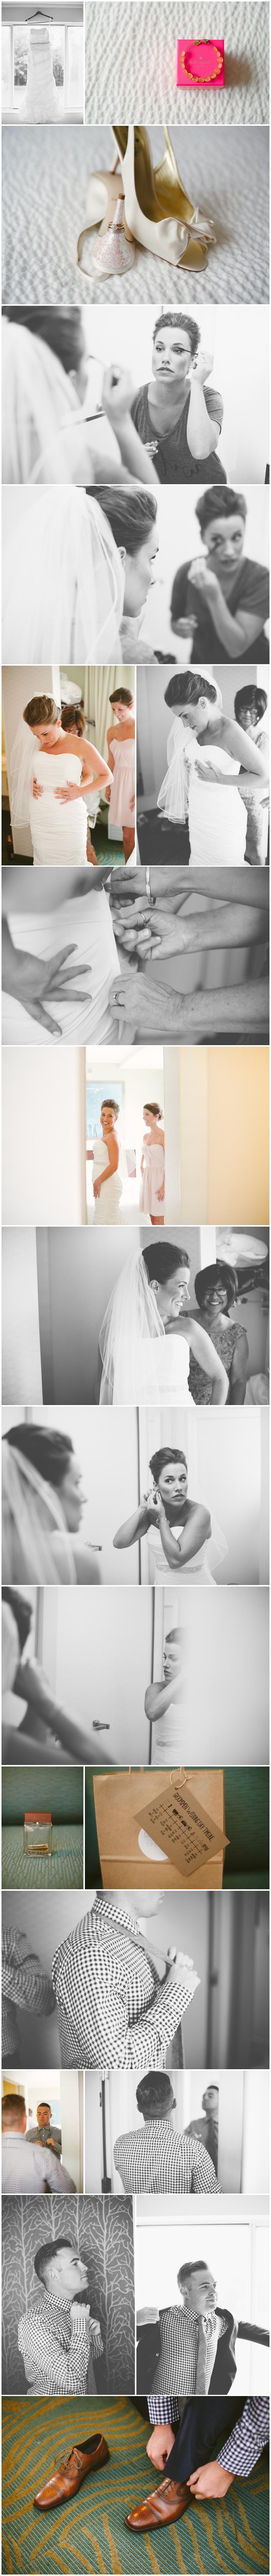 Blog Collage-L+A2